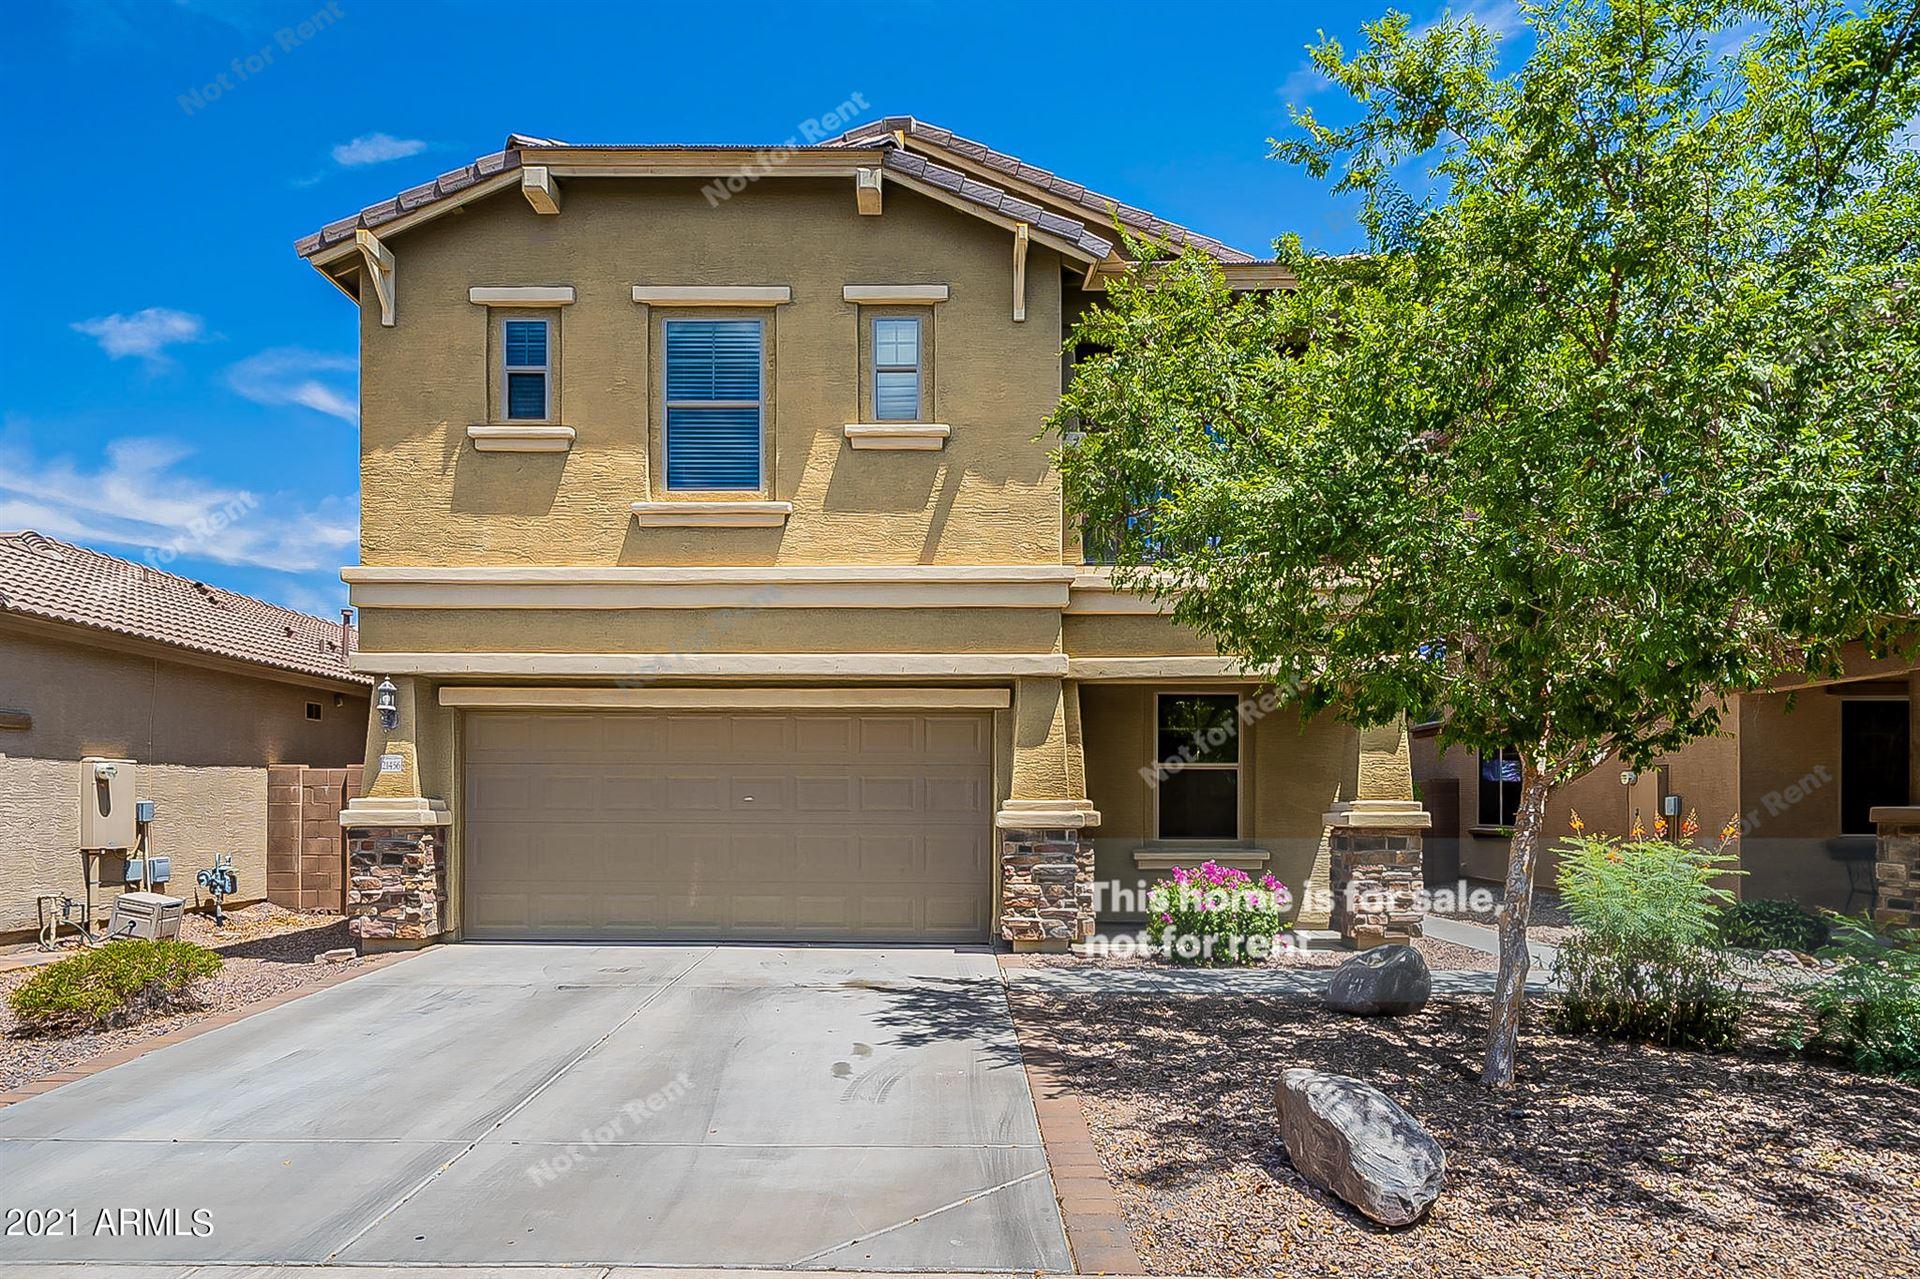 Photo of 21456 E DOMINGO Road, Queen Creek, AZ 85142 (MLS # 6249367)